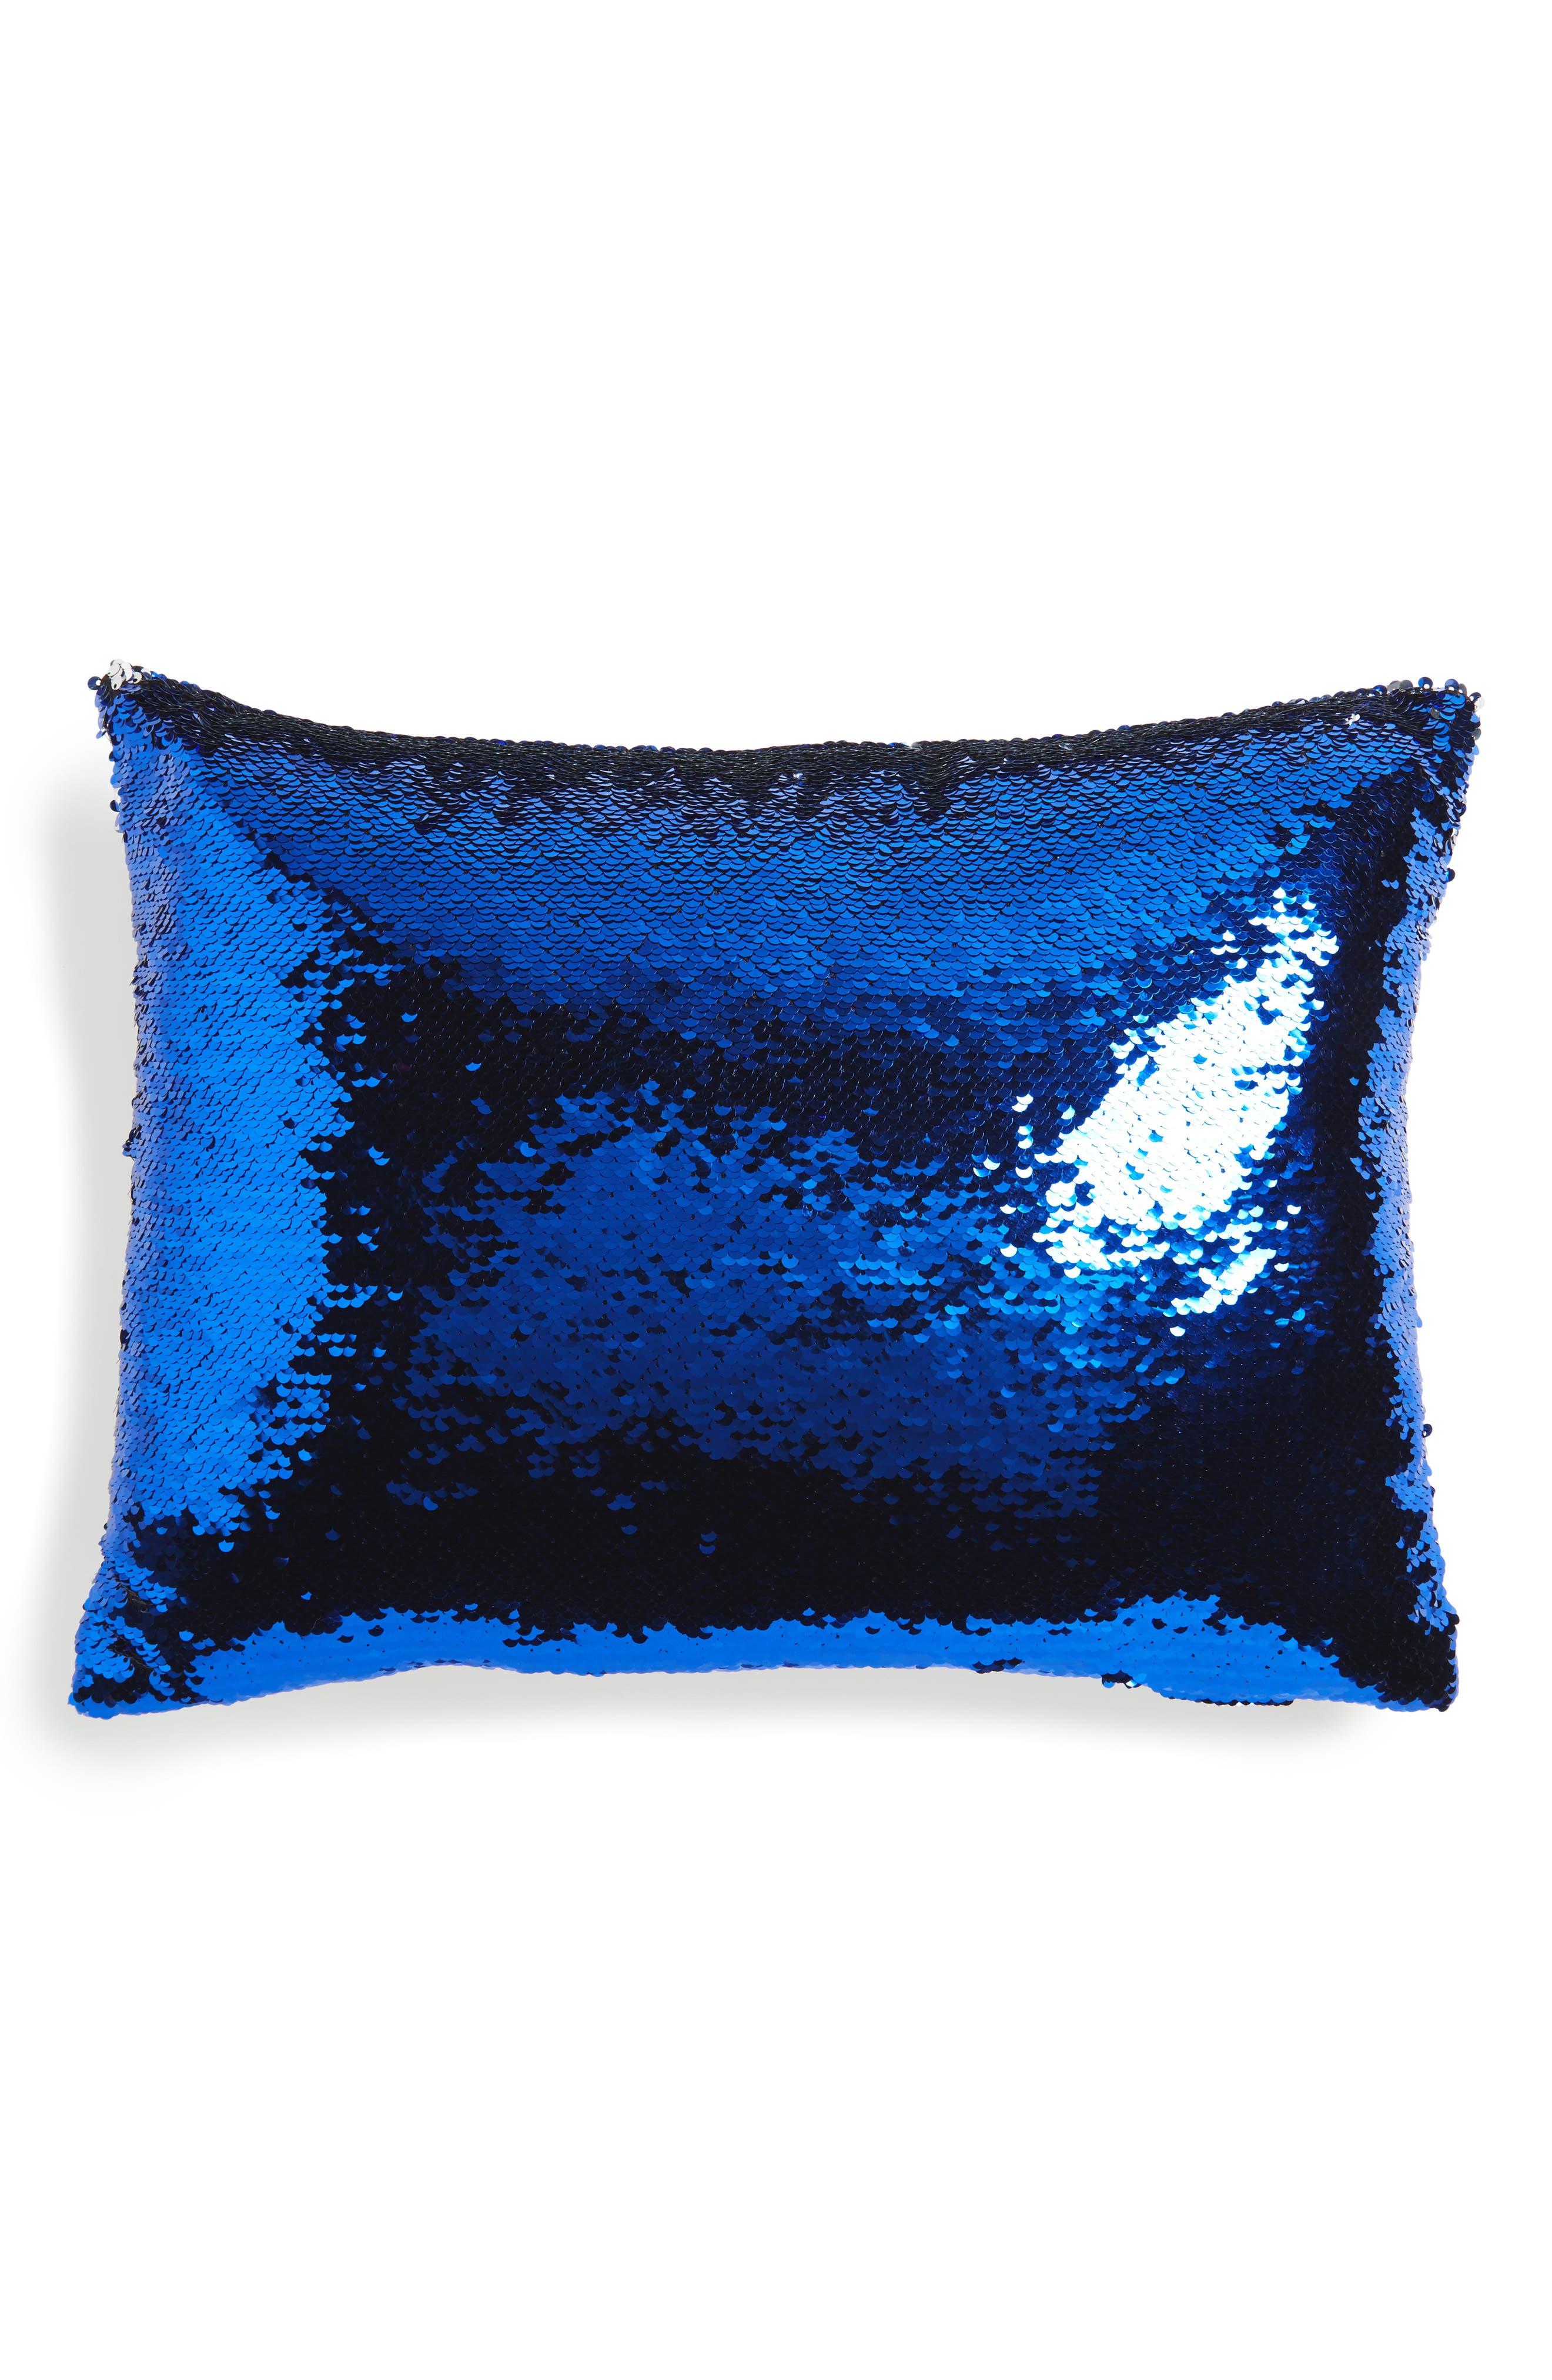 Sequin Pillow,                         Main,                         color, 400